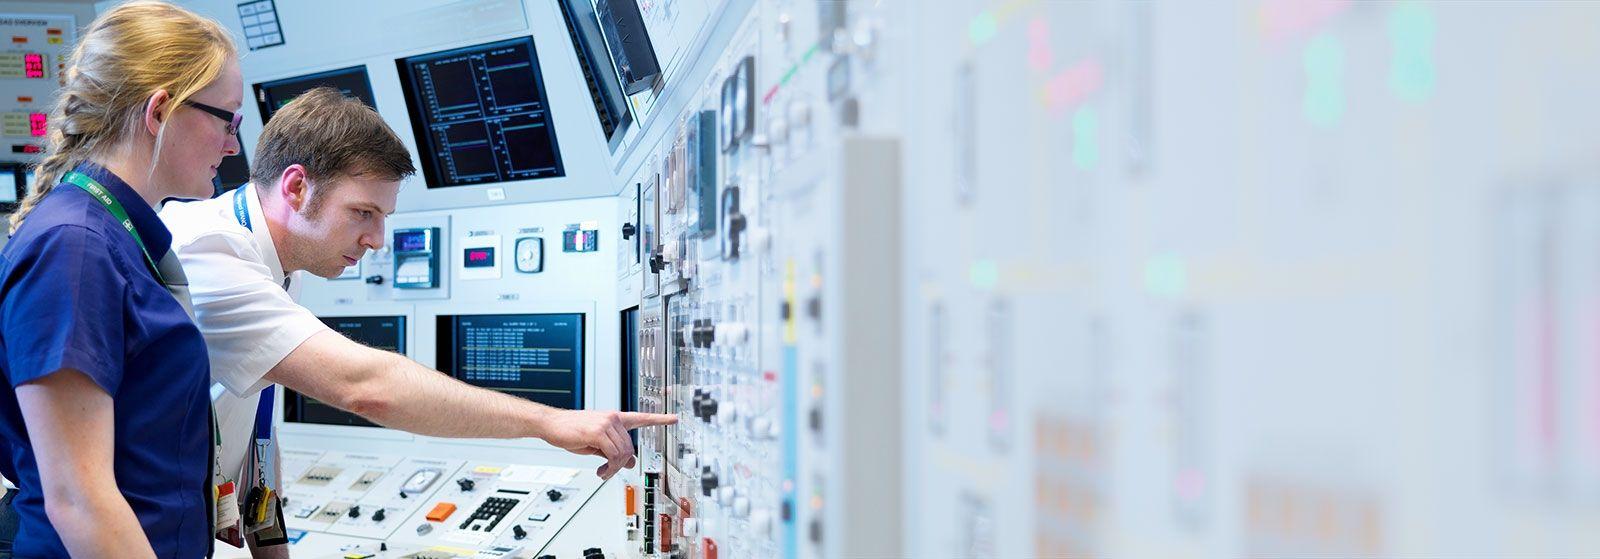 Sizewell B Edf Energy Inside A Nuclear Power Plant Diagram Control Room